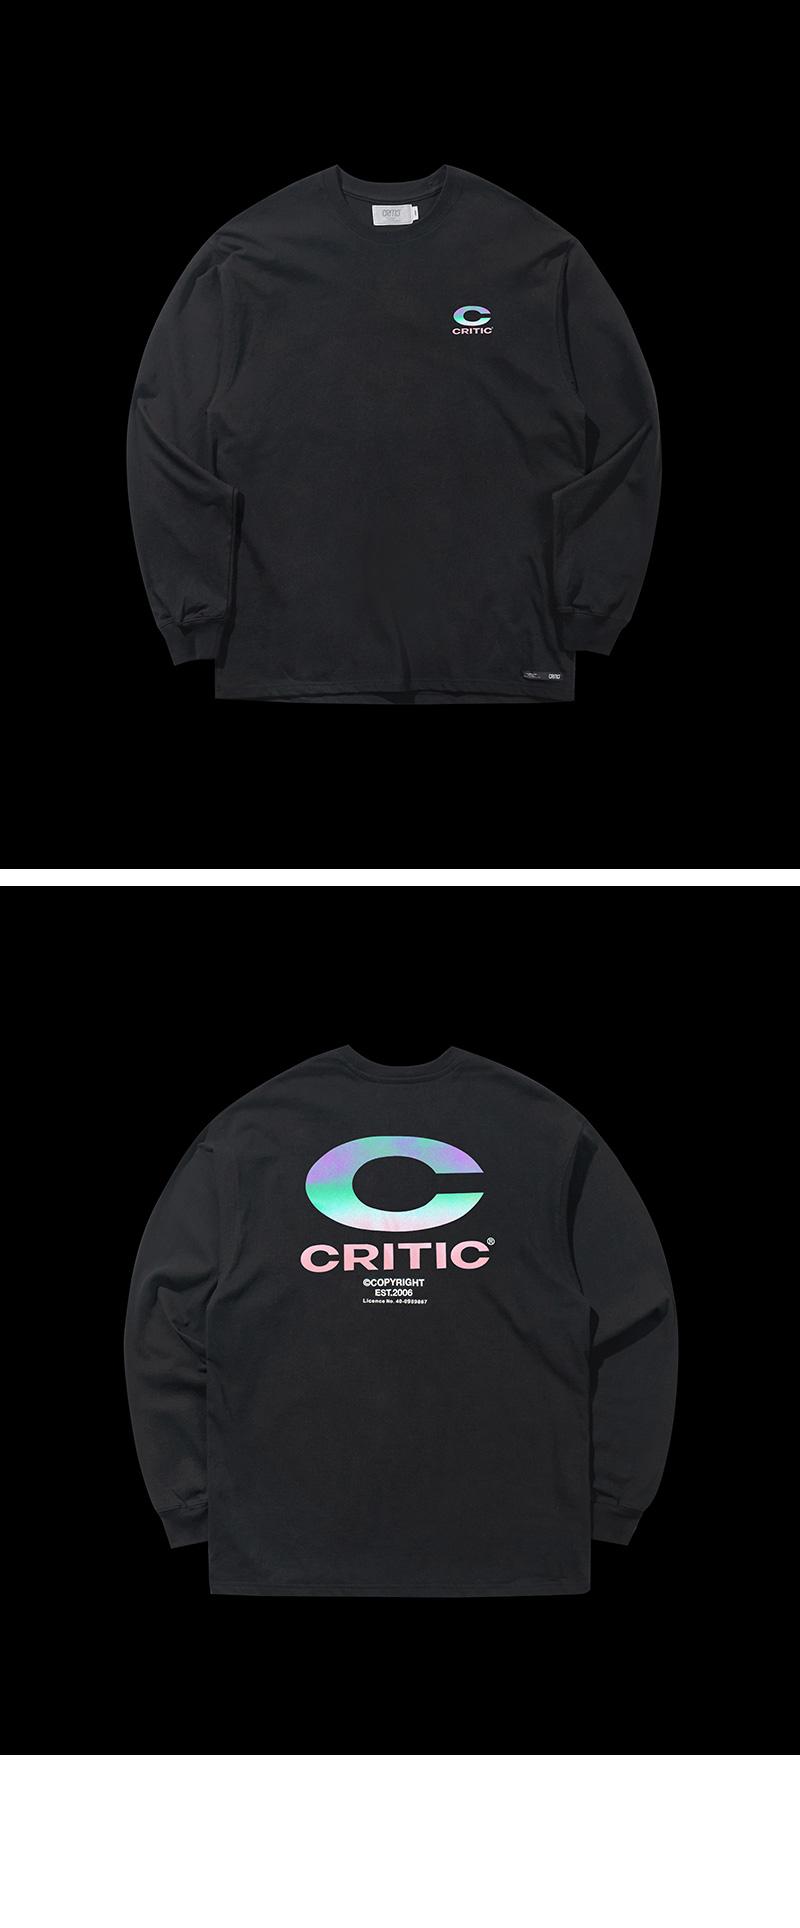 REFLECTIVE BIG C LOGO LONG SLEEVE T-SHIRT(BLACK)_CTONARL02UC6